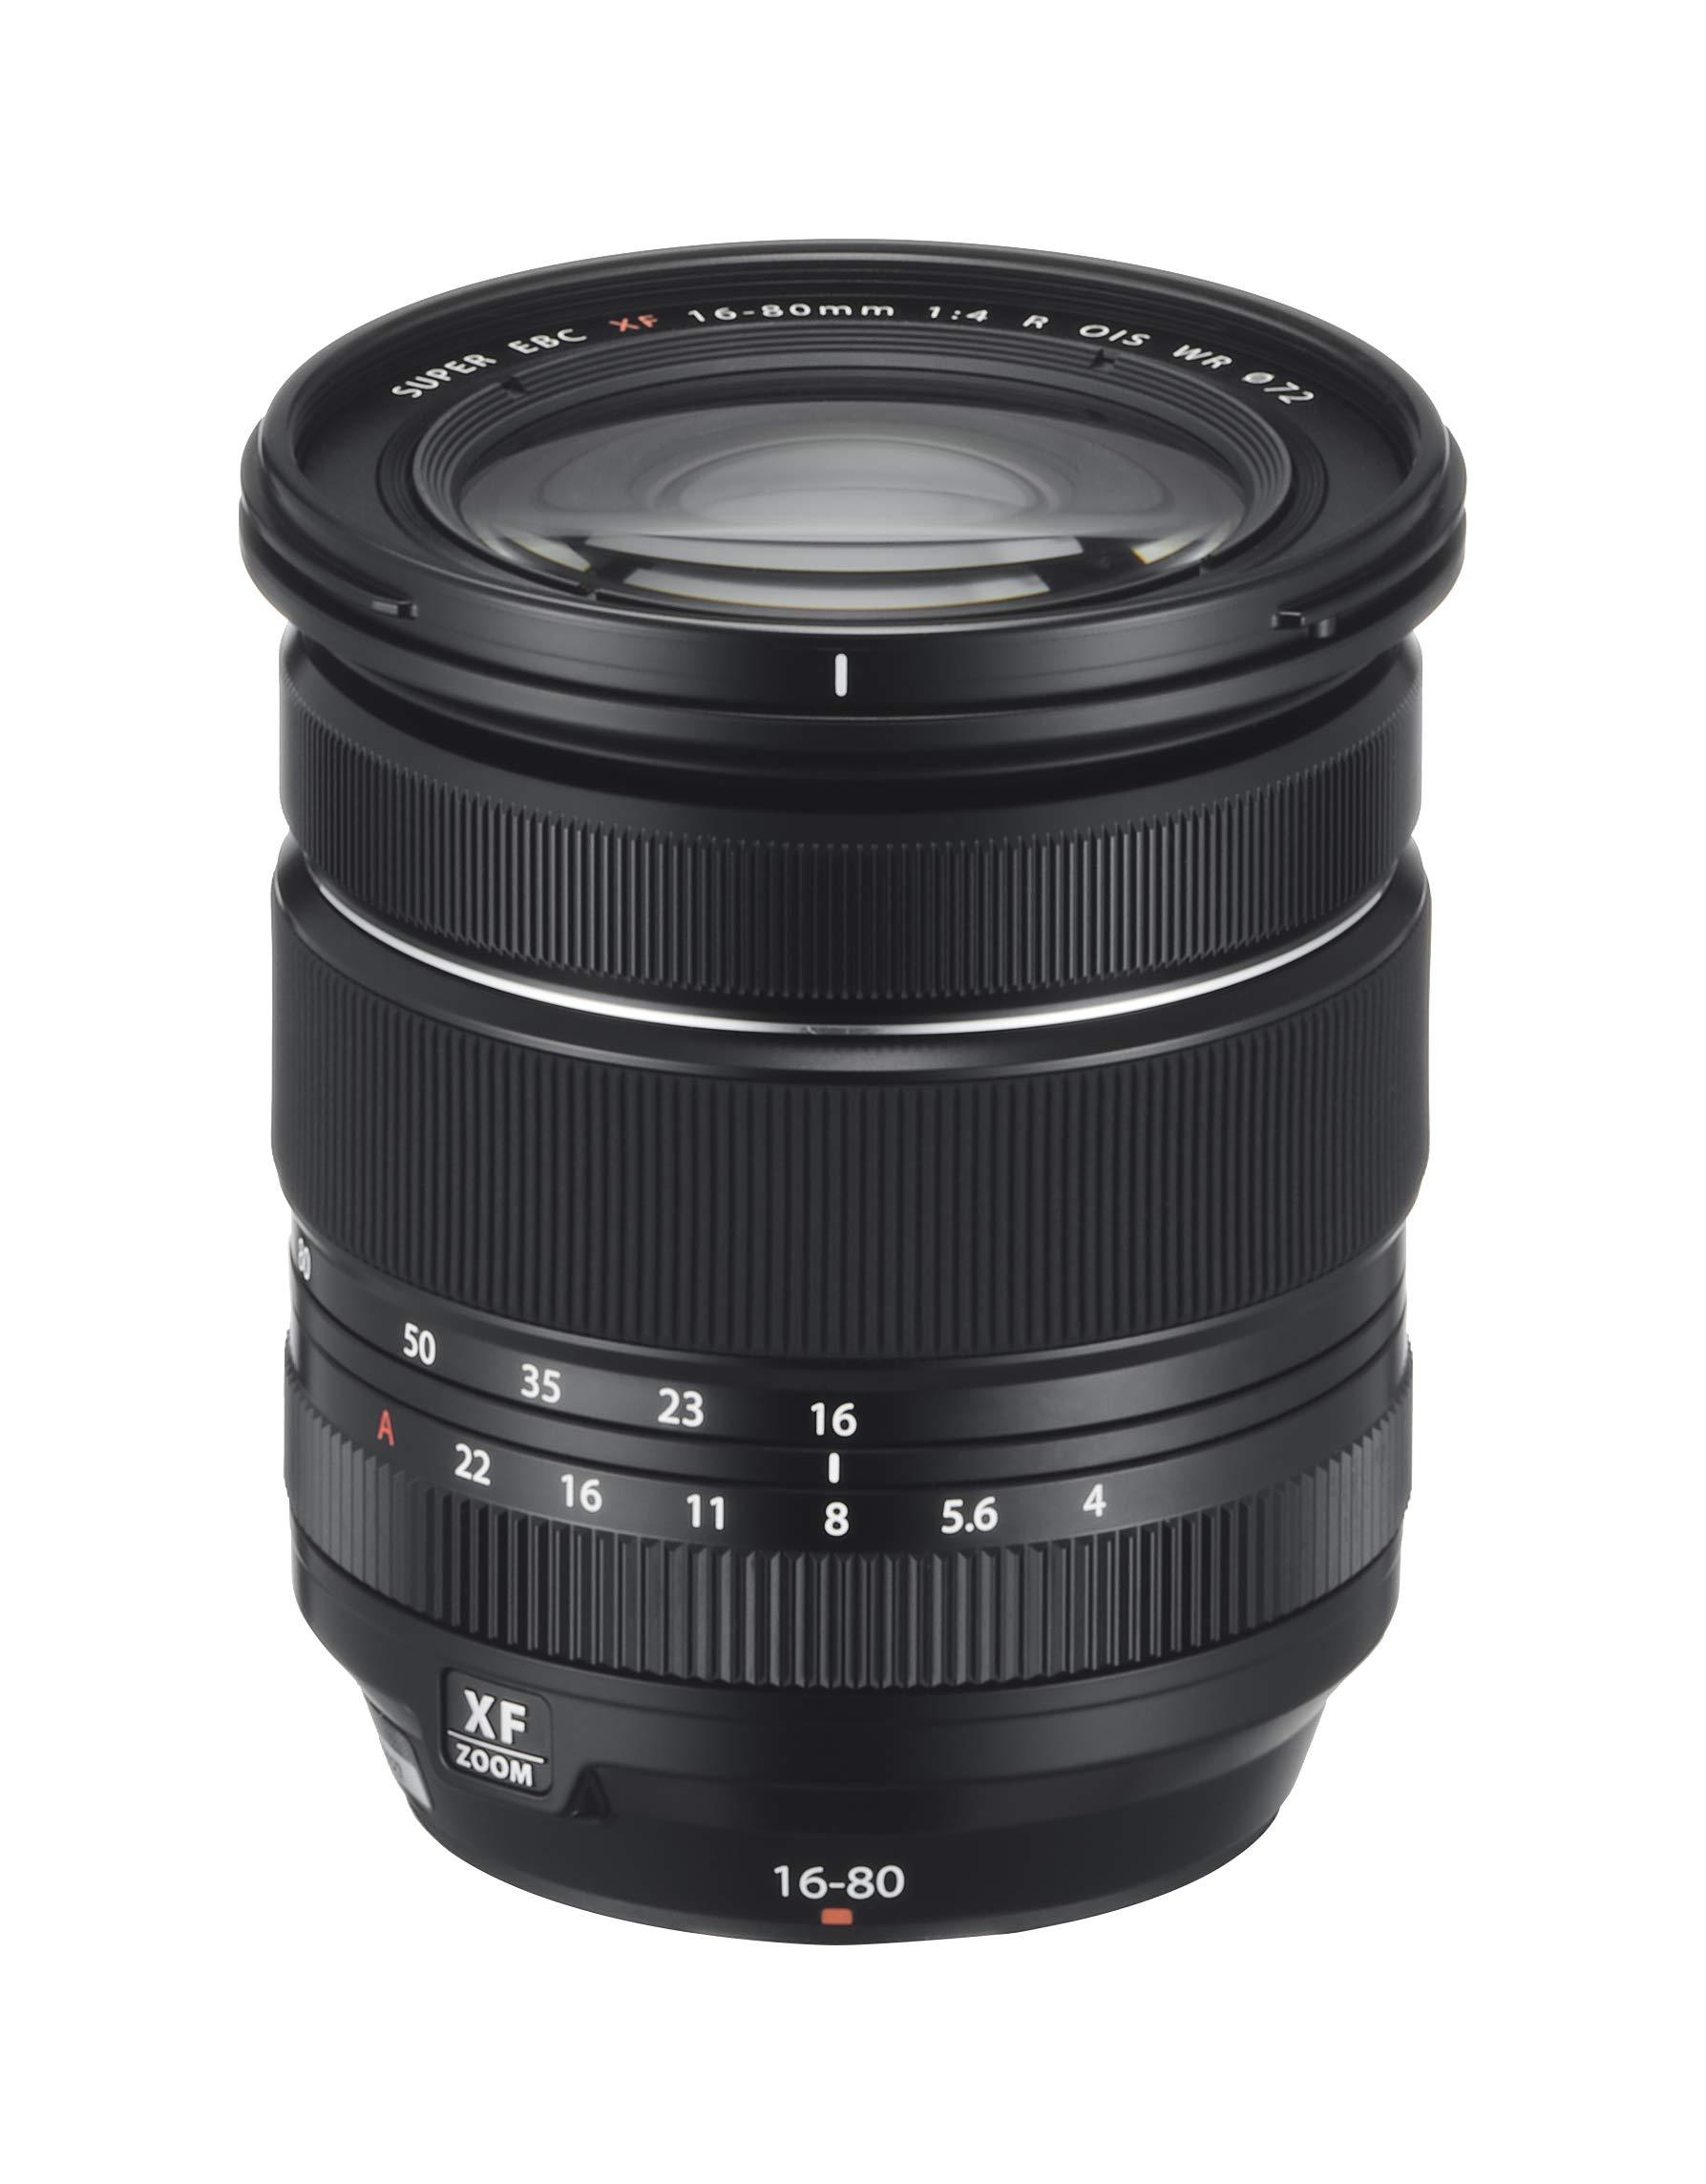 (Amazon) Fujifilm FUJINON XF16-80mmF4 R OIS WR